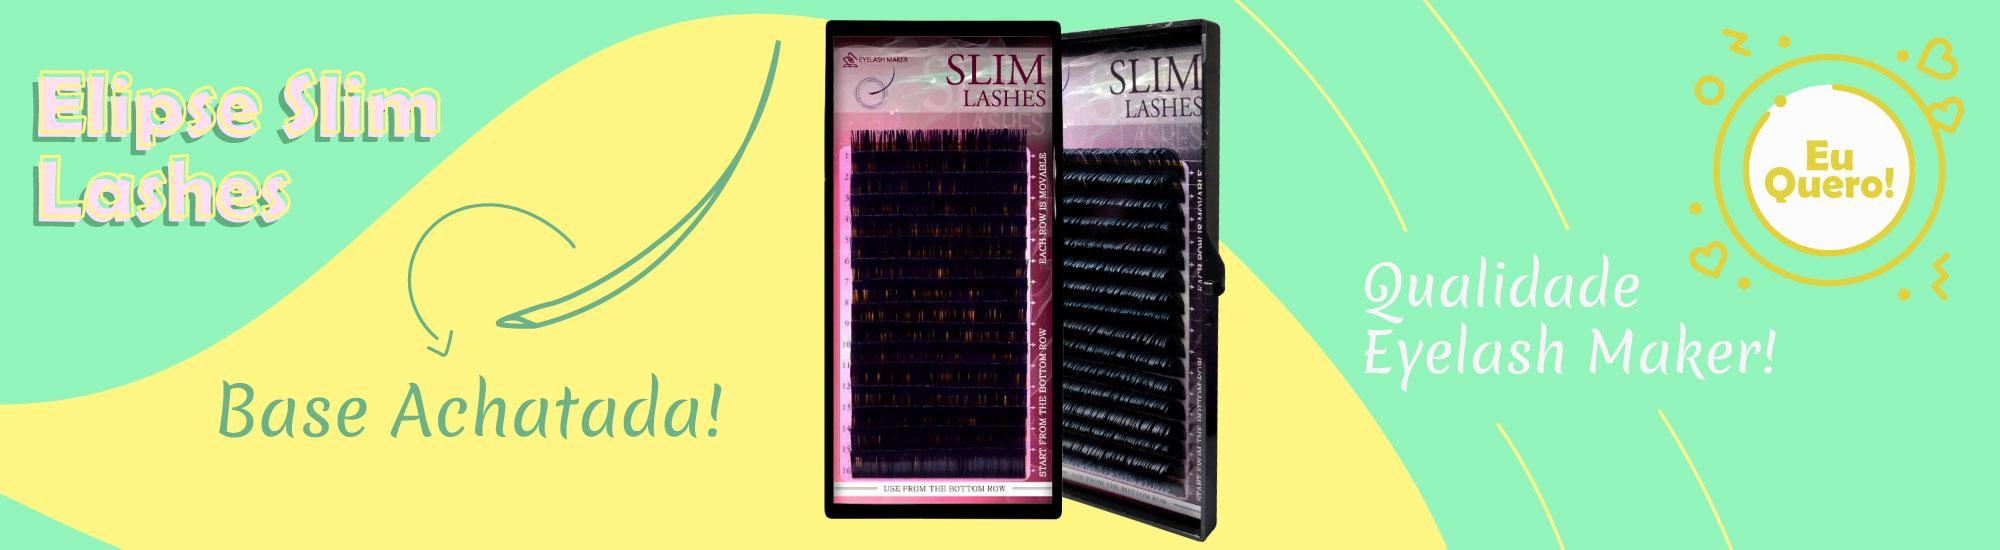 Slim Lashes Eyelash Maker